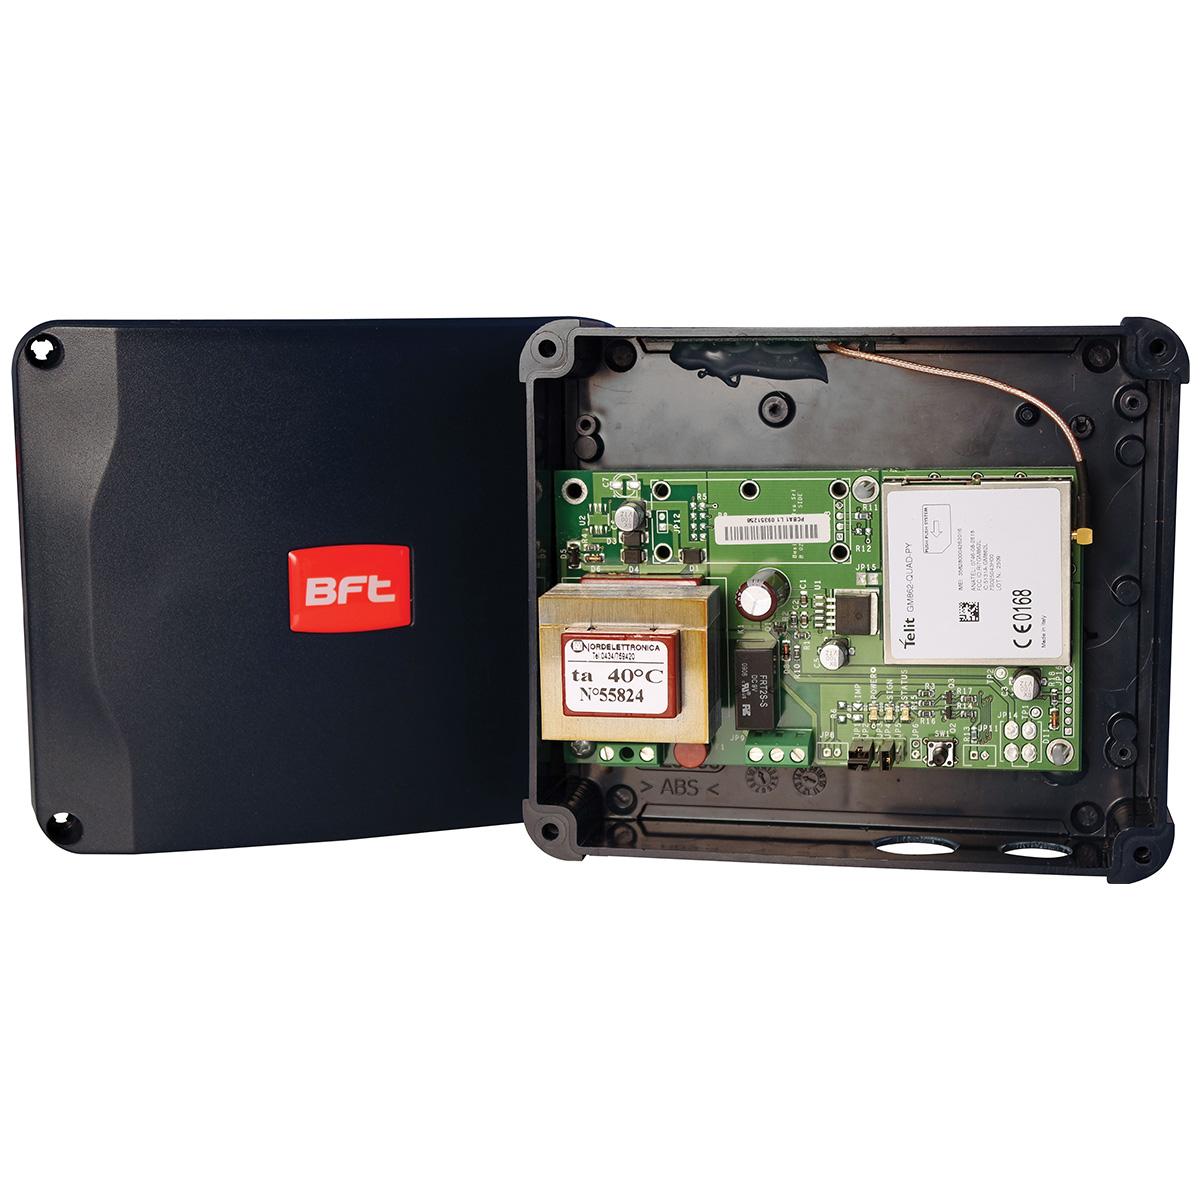 BFT GSM RECEIVER